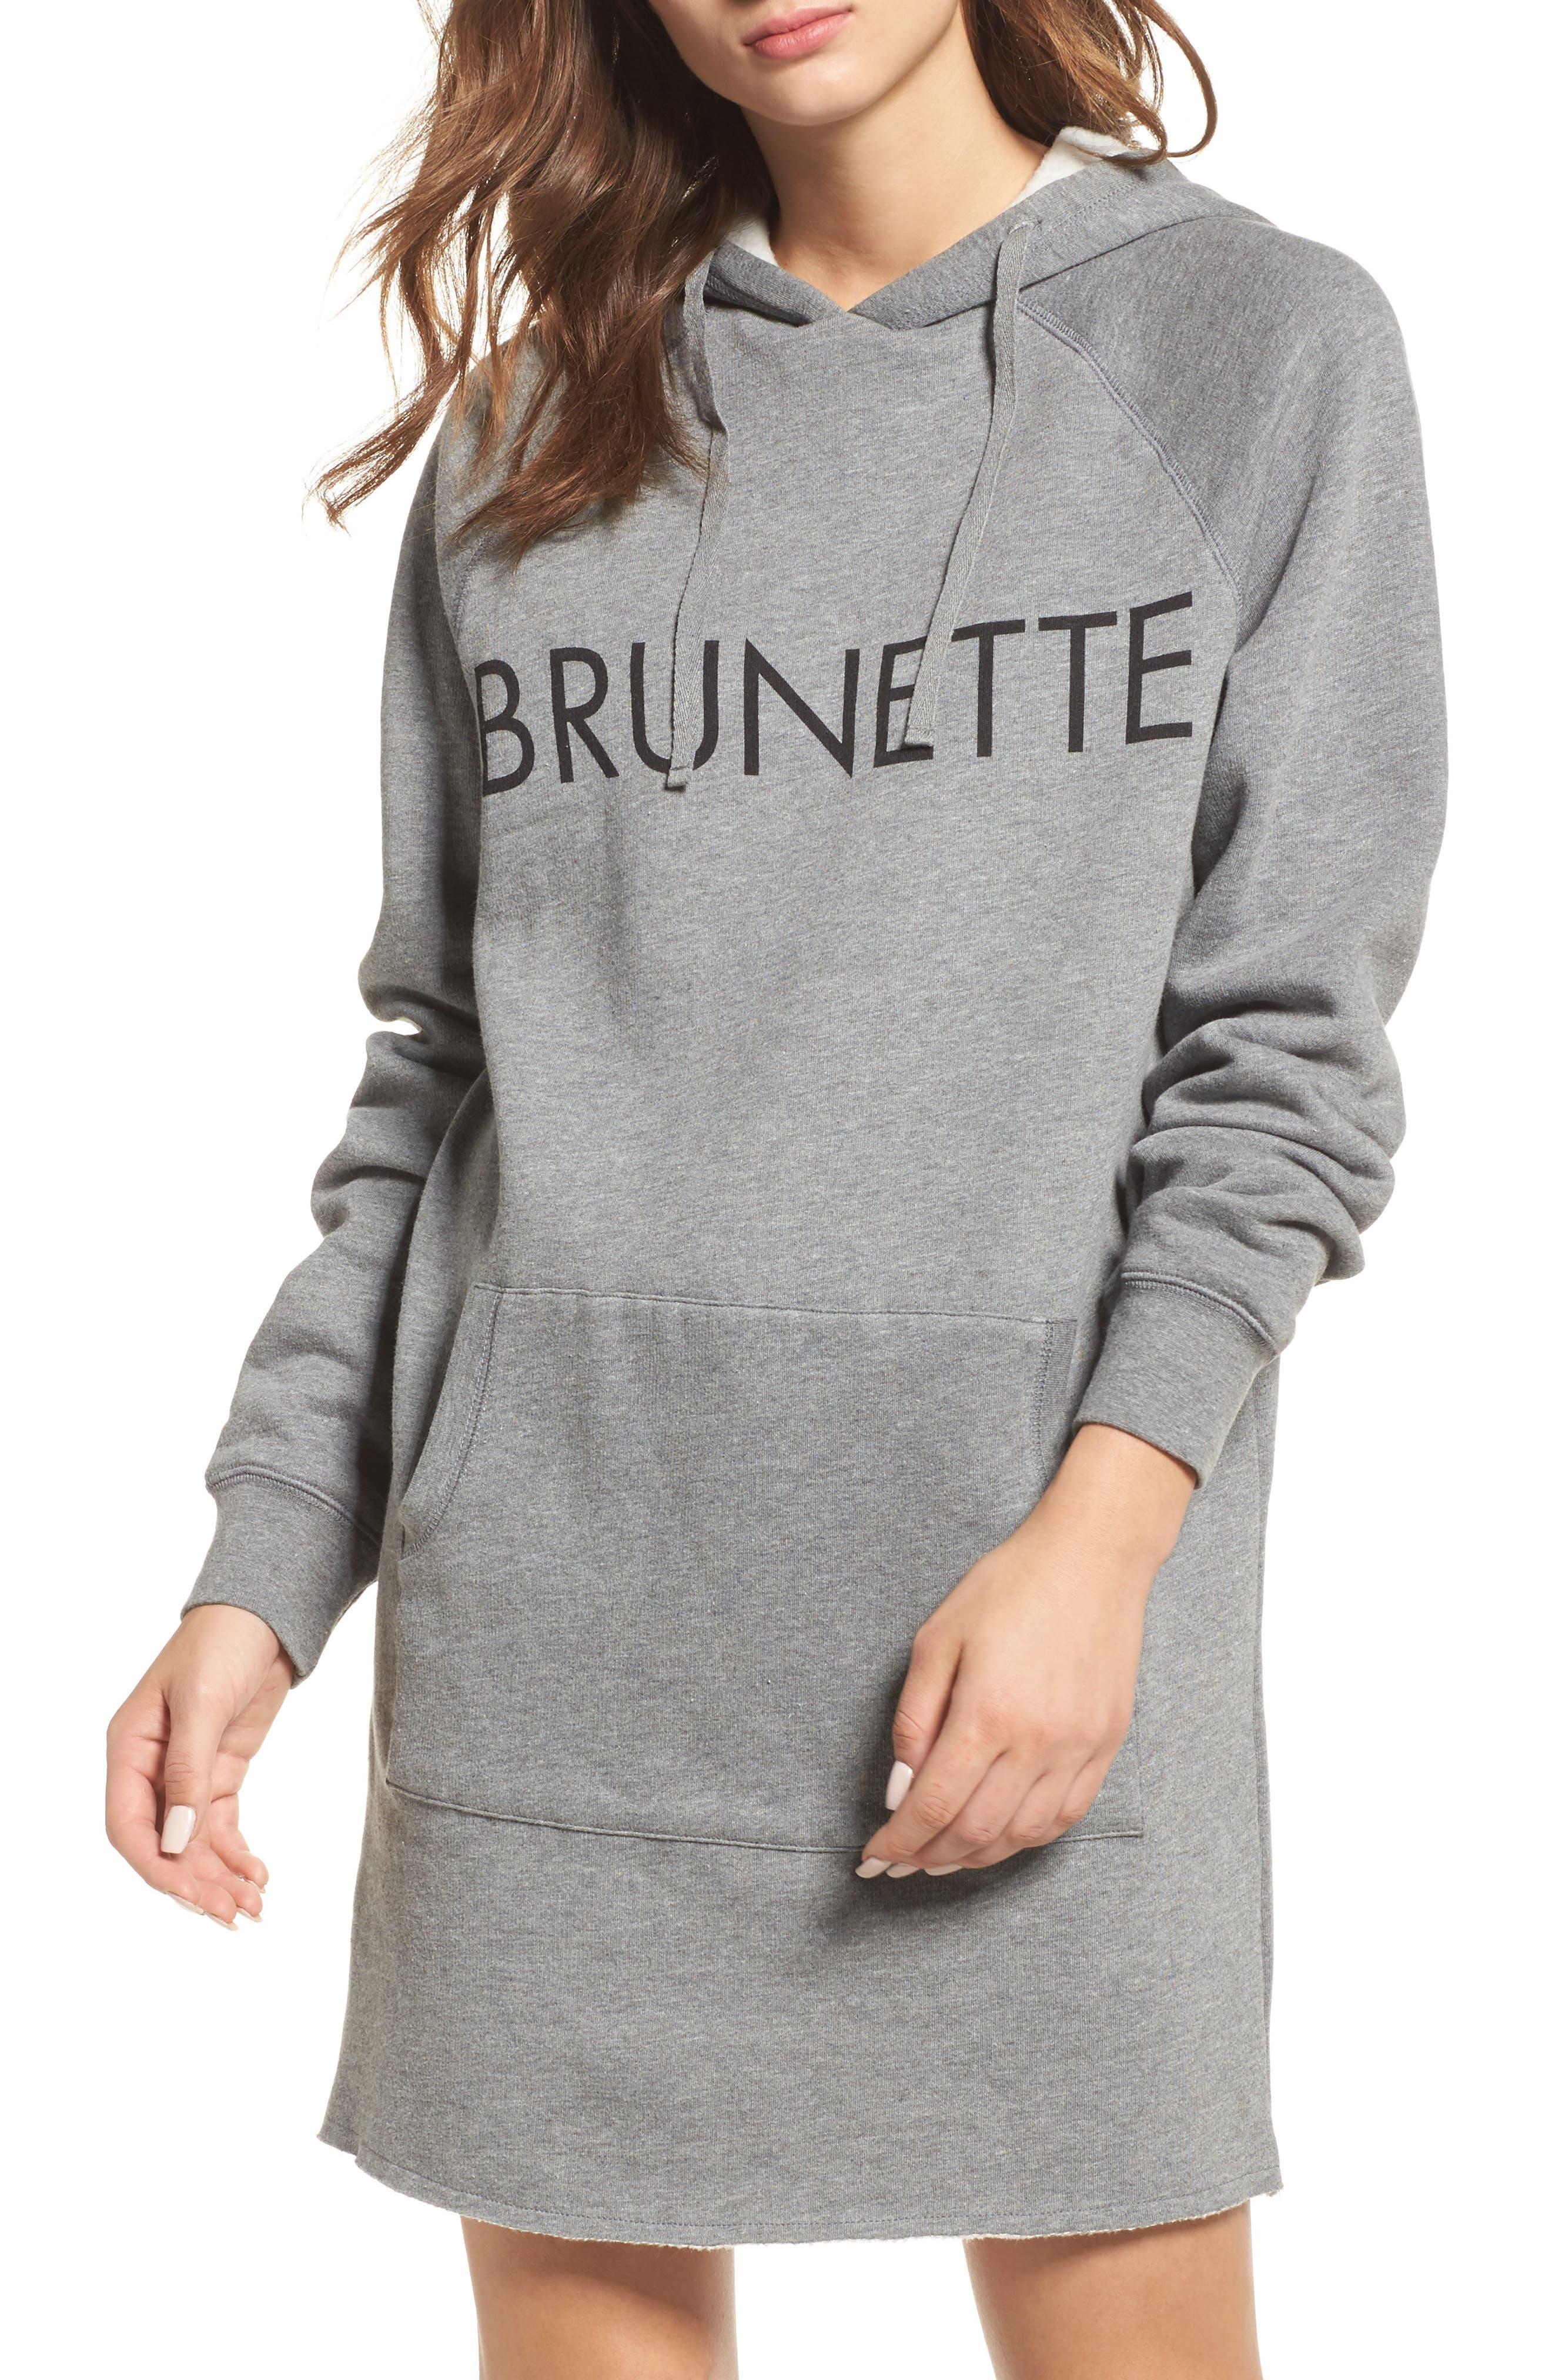 Alternate Image 1 Selected - BRUNETTE the Label Brunette Sweatshirt Dress